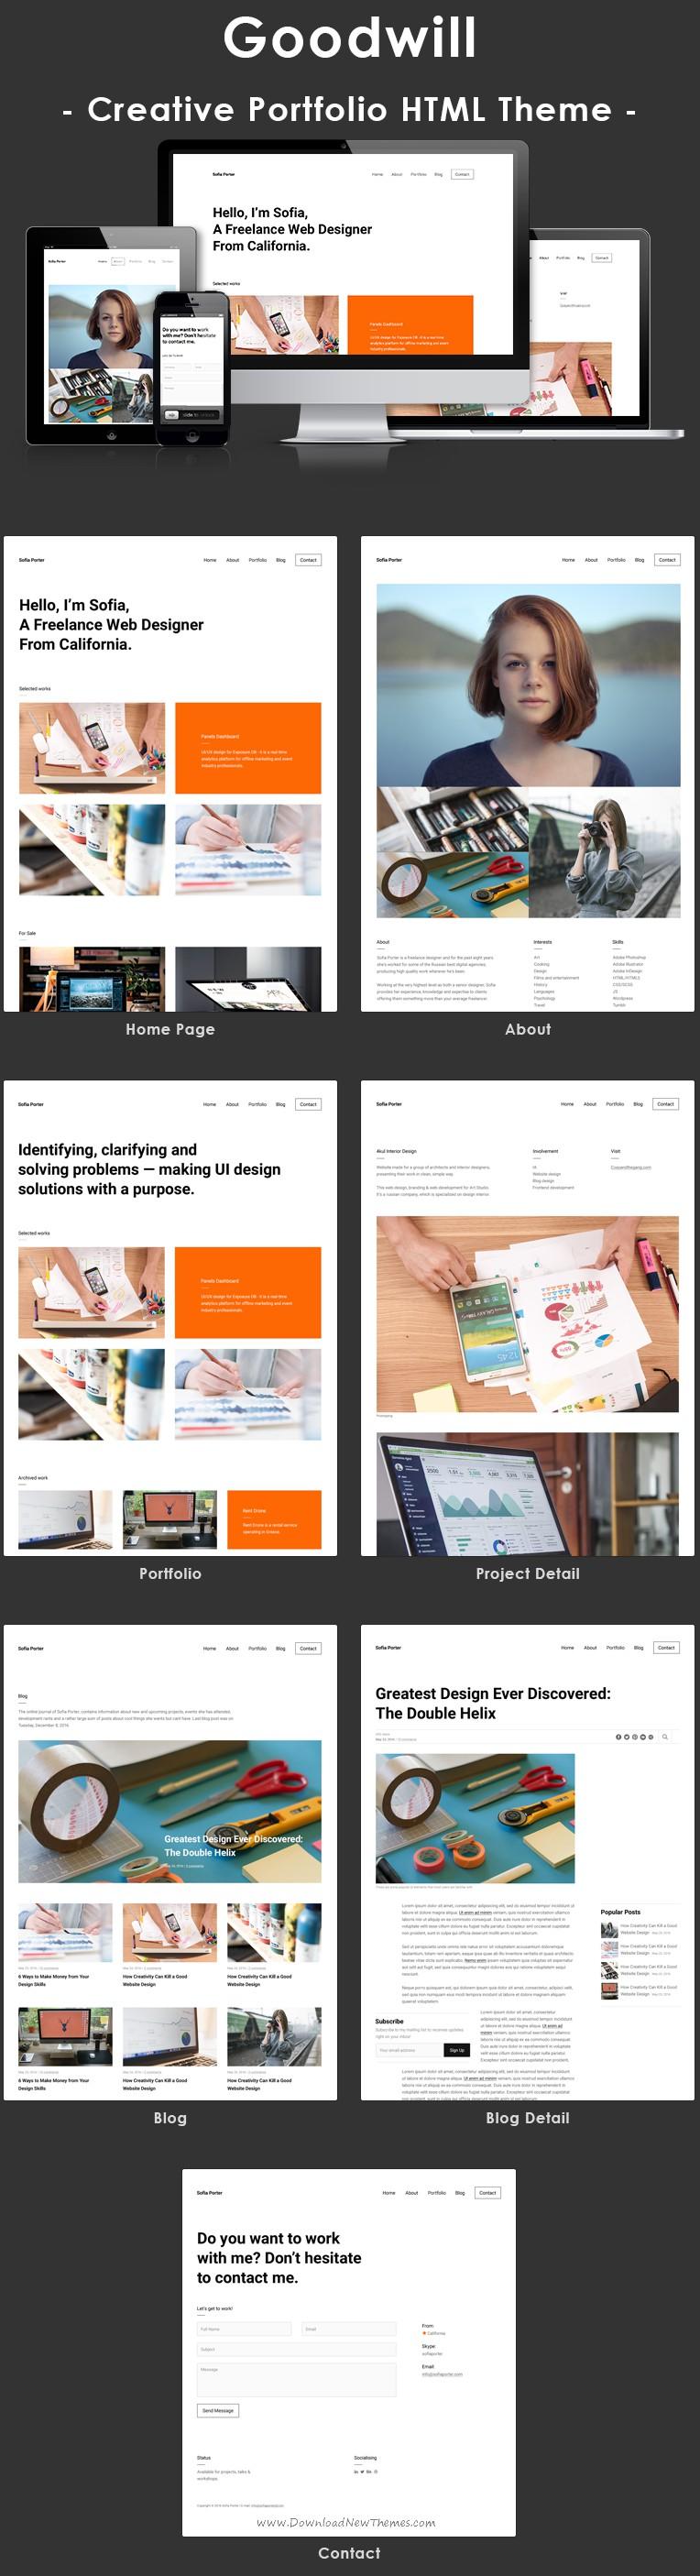 Goodwill – Creative, Clean, Portfolio Template